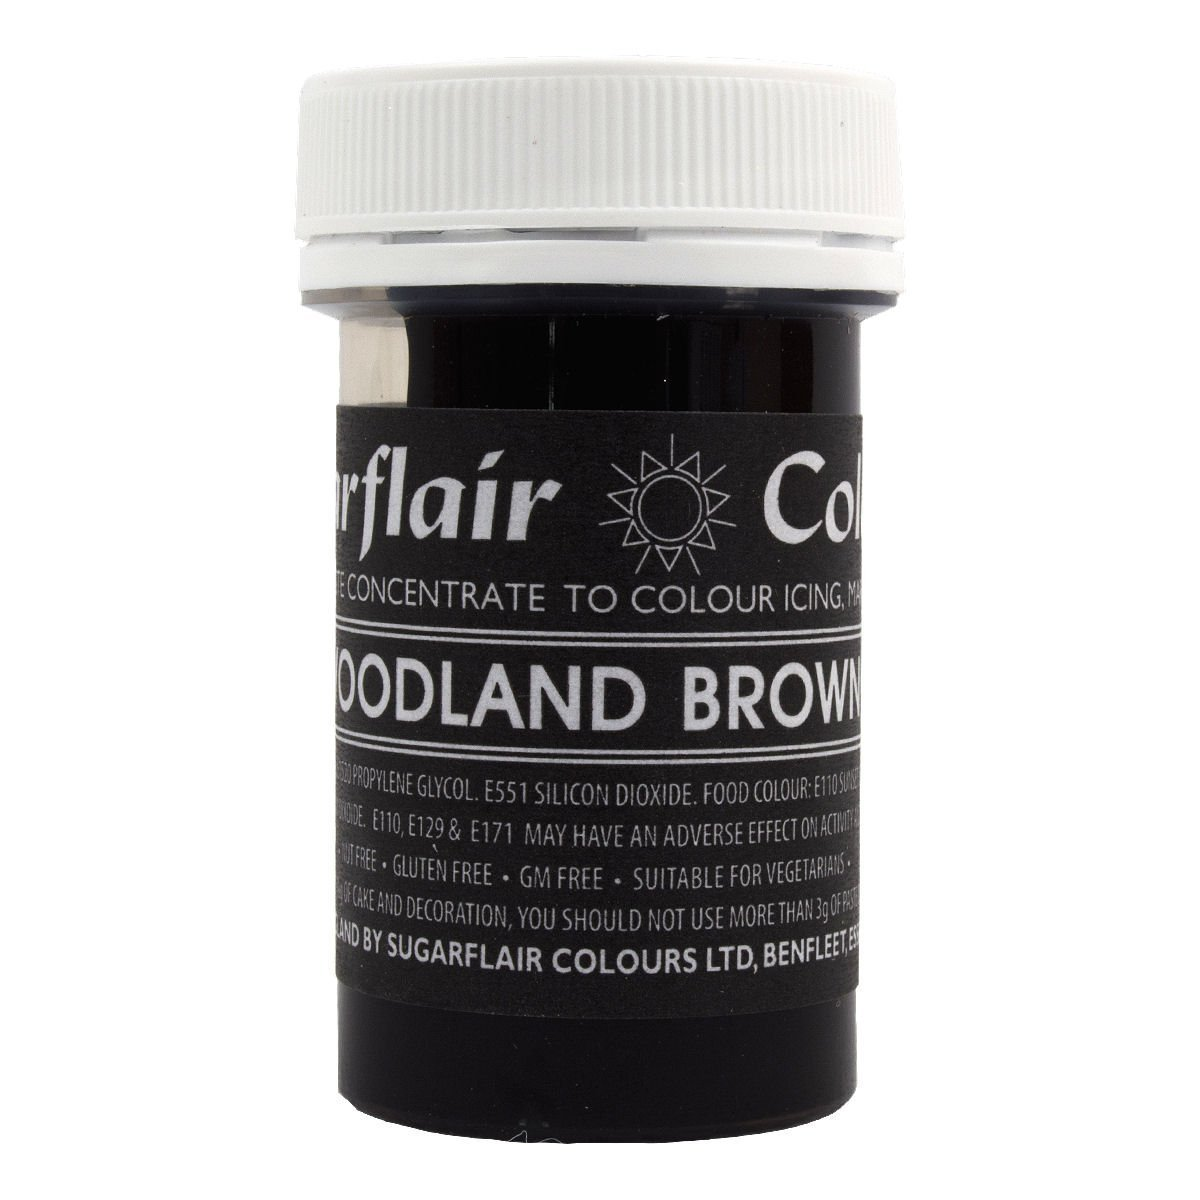 50 x Sugarflair WOODLAND BROWN Pastel Edible Food Cake Icing Colour Paste 25g